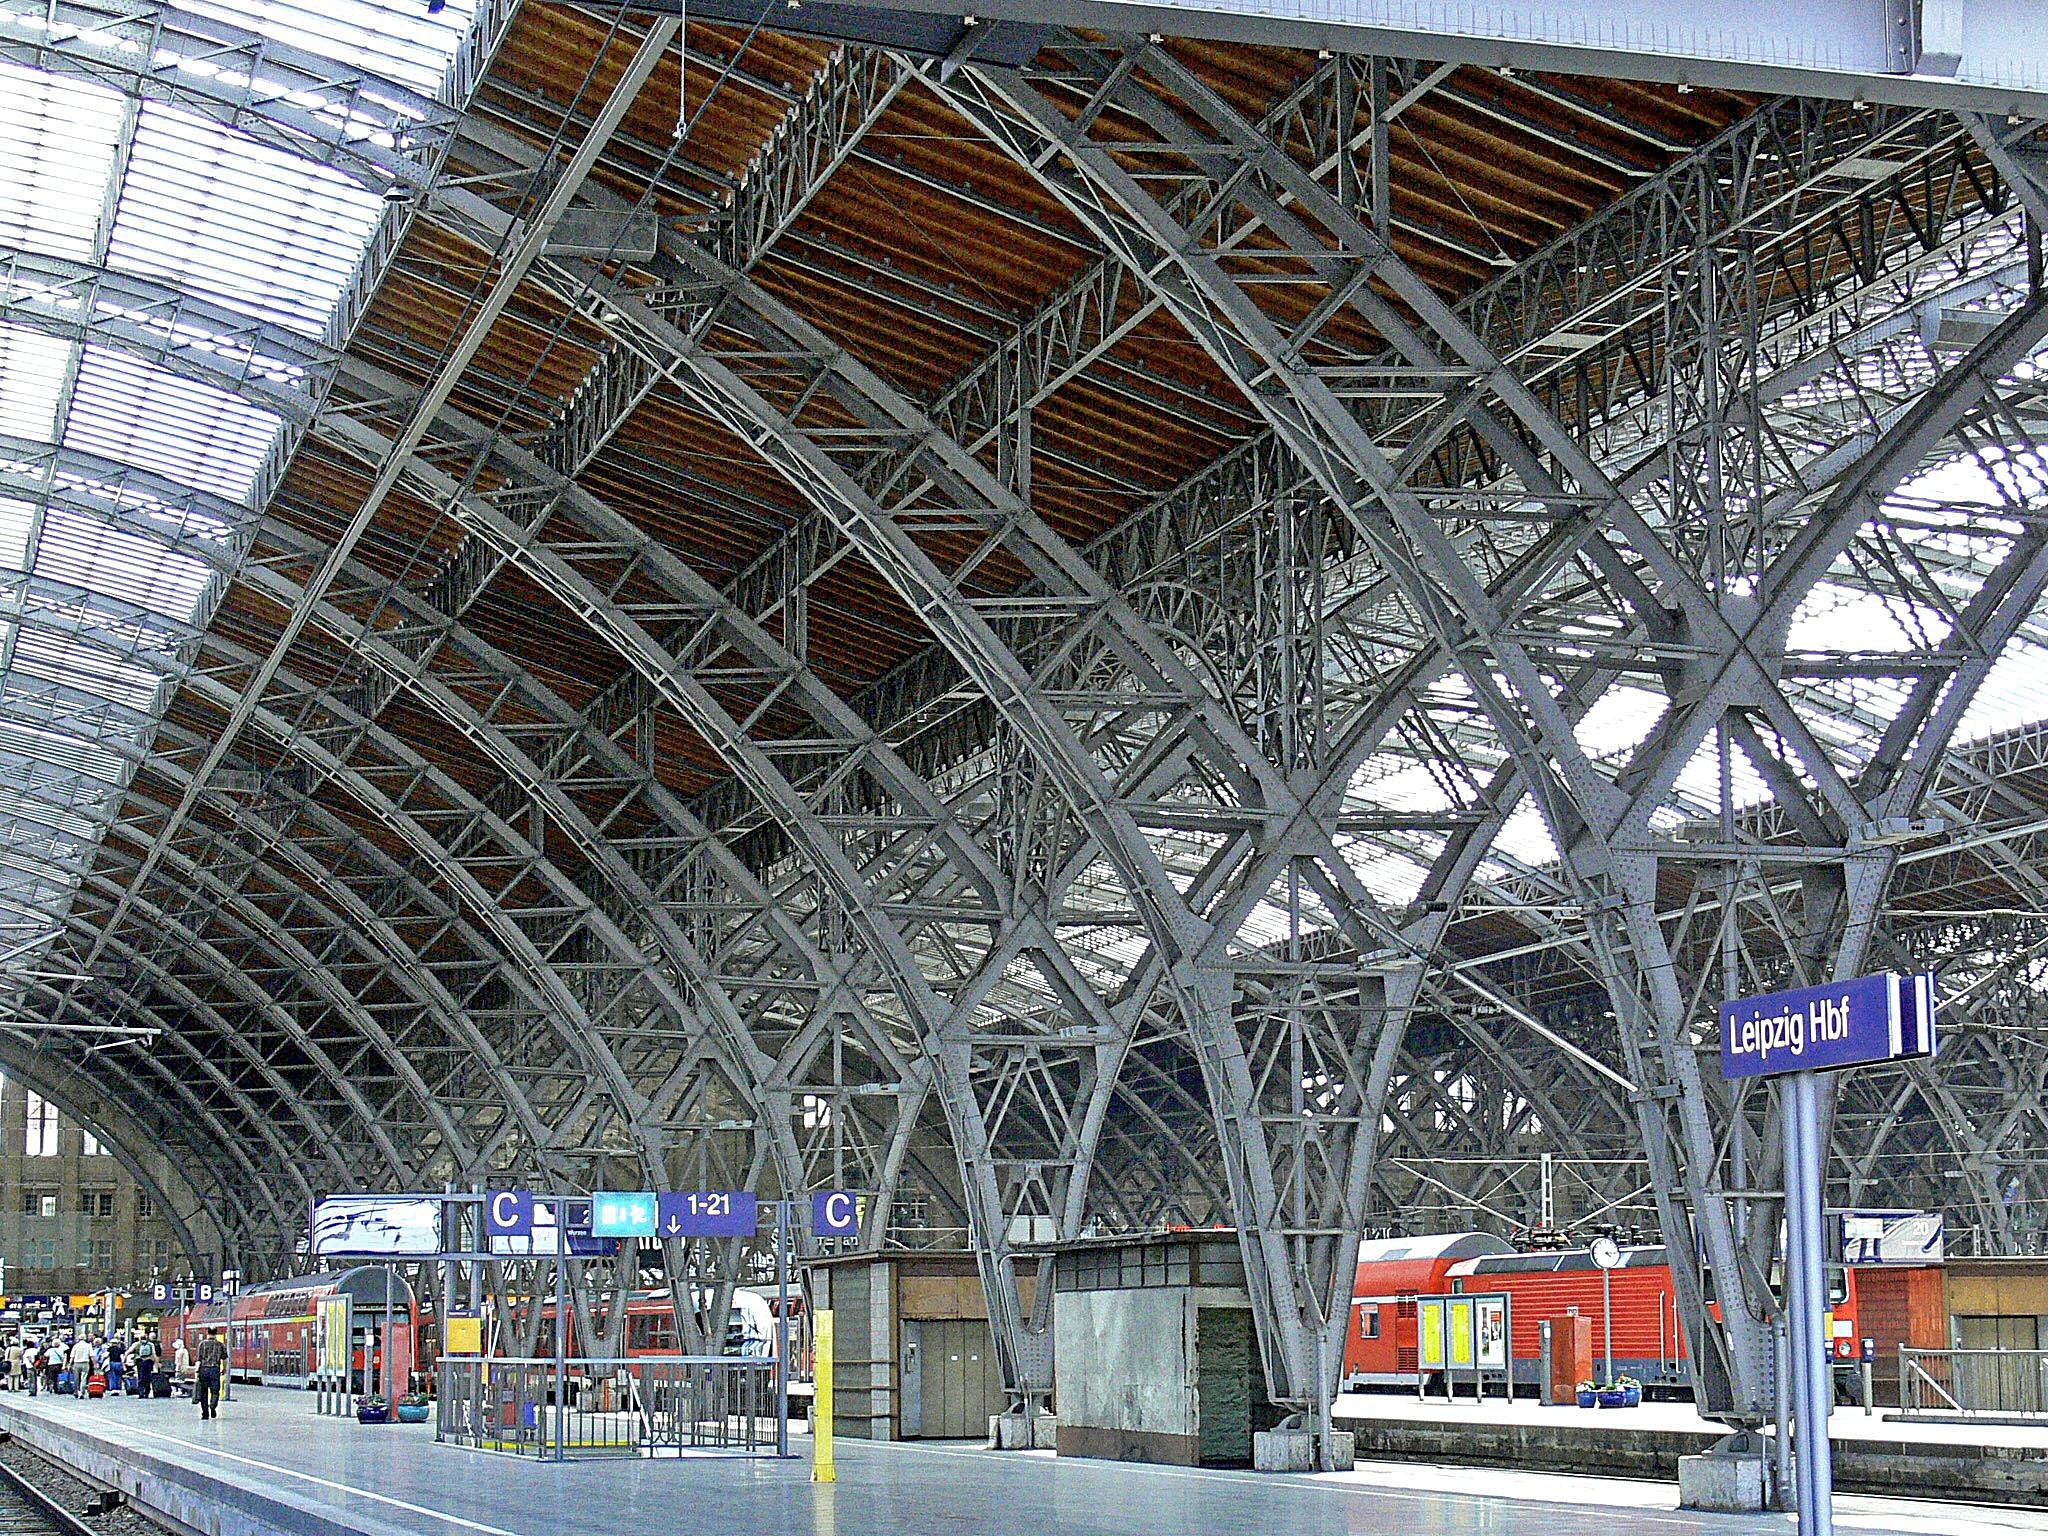 Fotos gratis tecnologa edificio estacin de tren plataforma